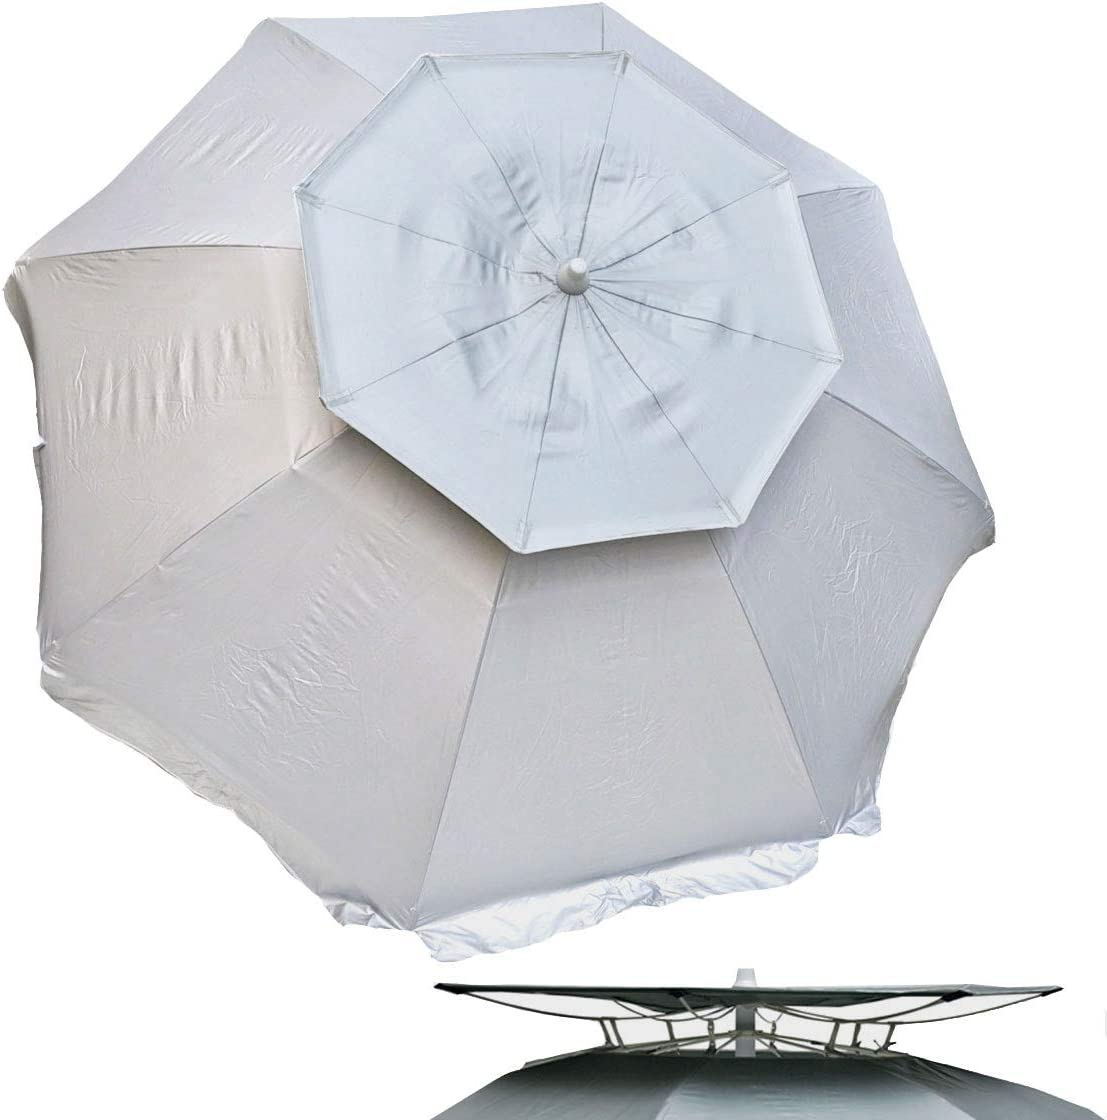 Solar Guard 6 ft Dual Canopy Heavy Duty Beach Umbrella Shelter UPF 150 Ultra Cool – Wind Resistant